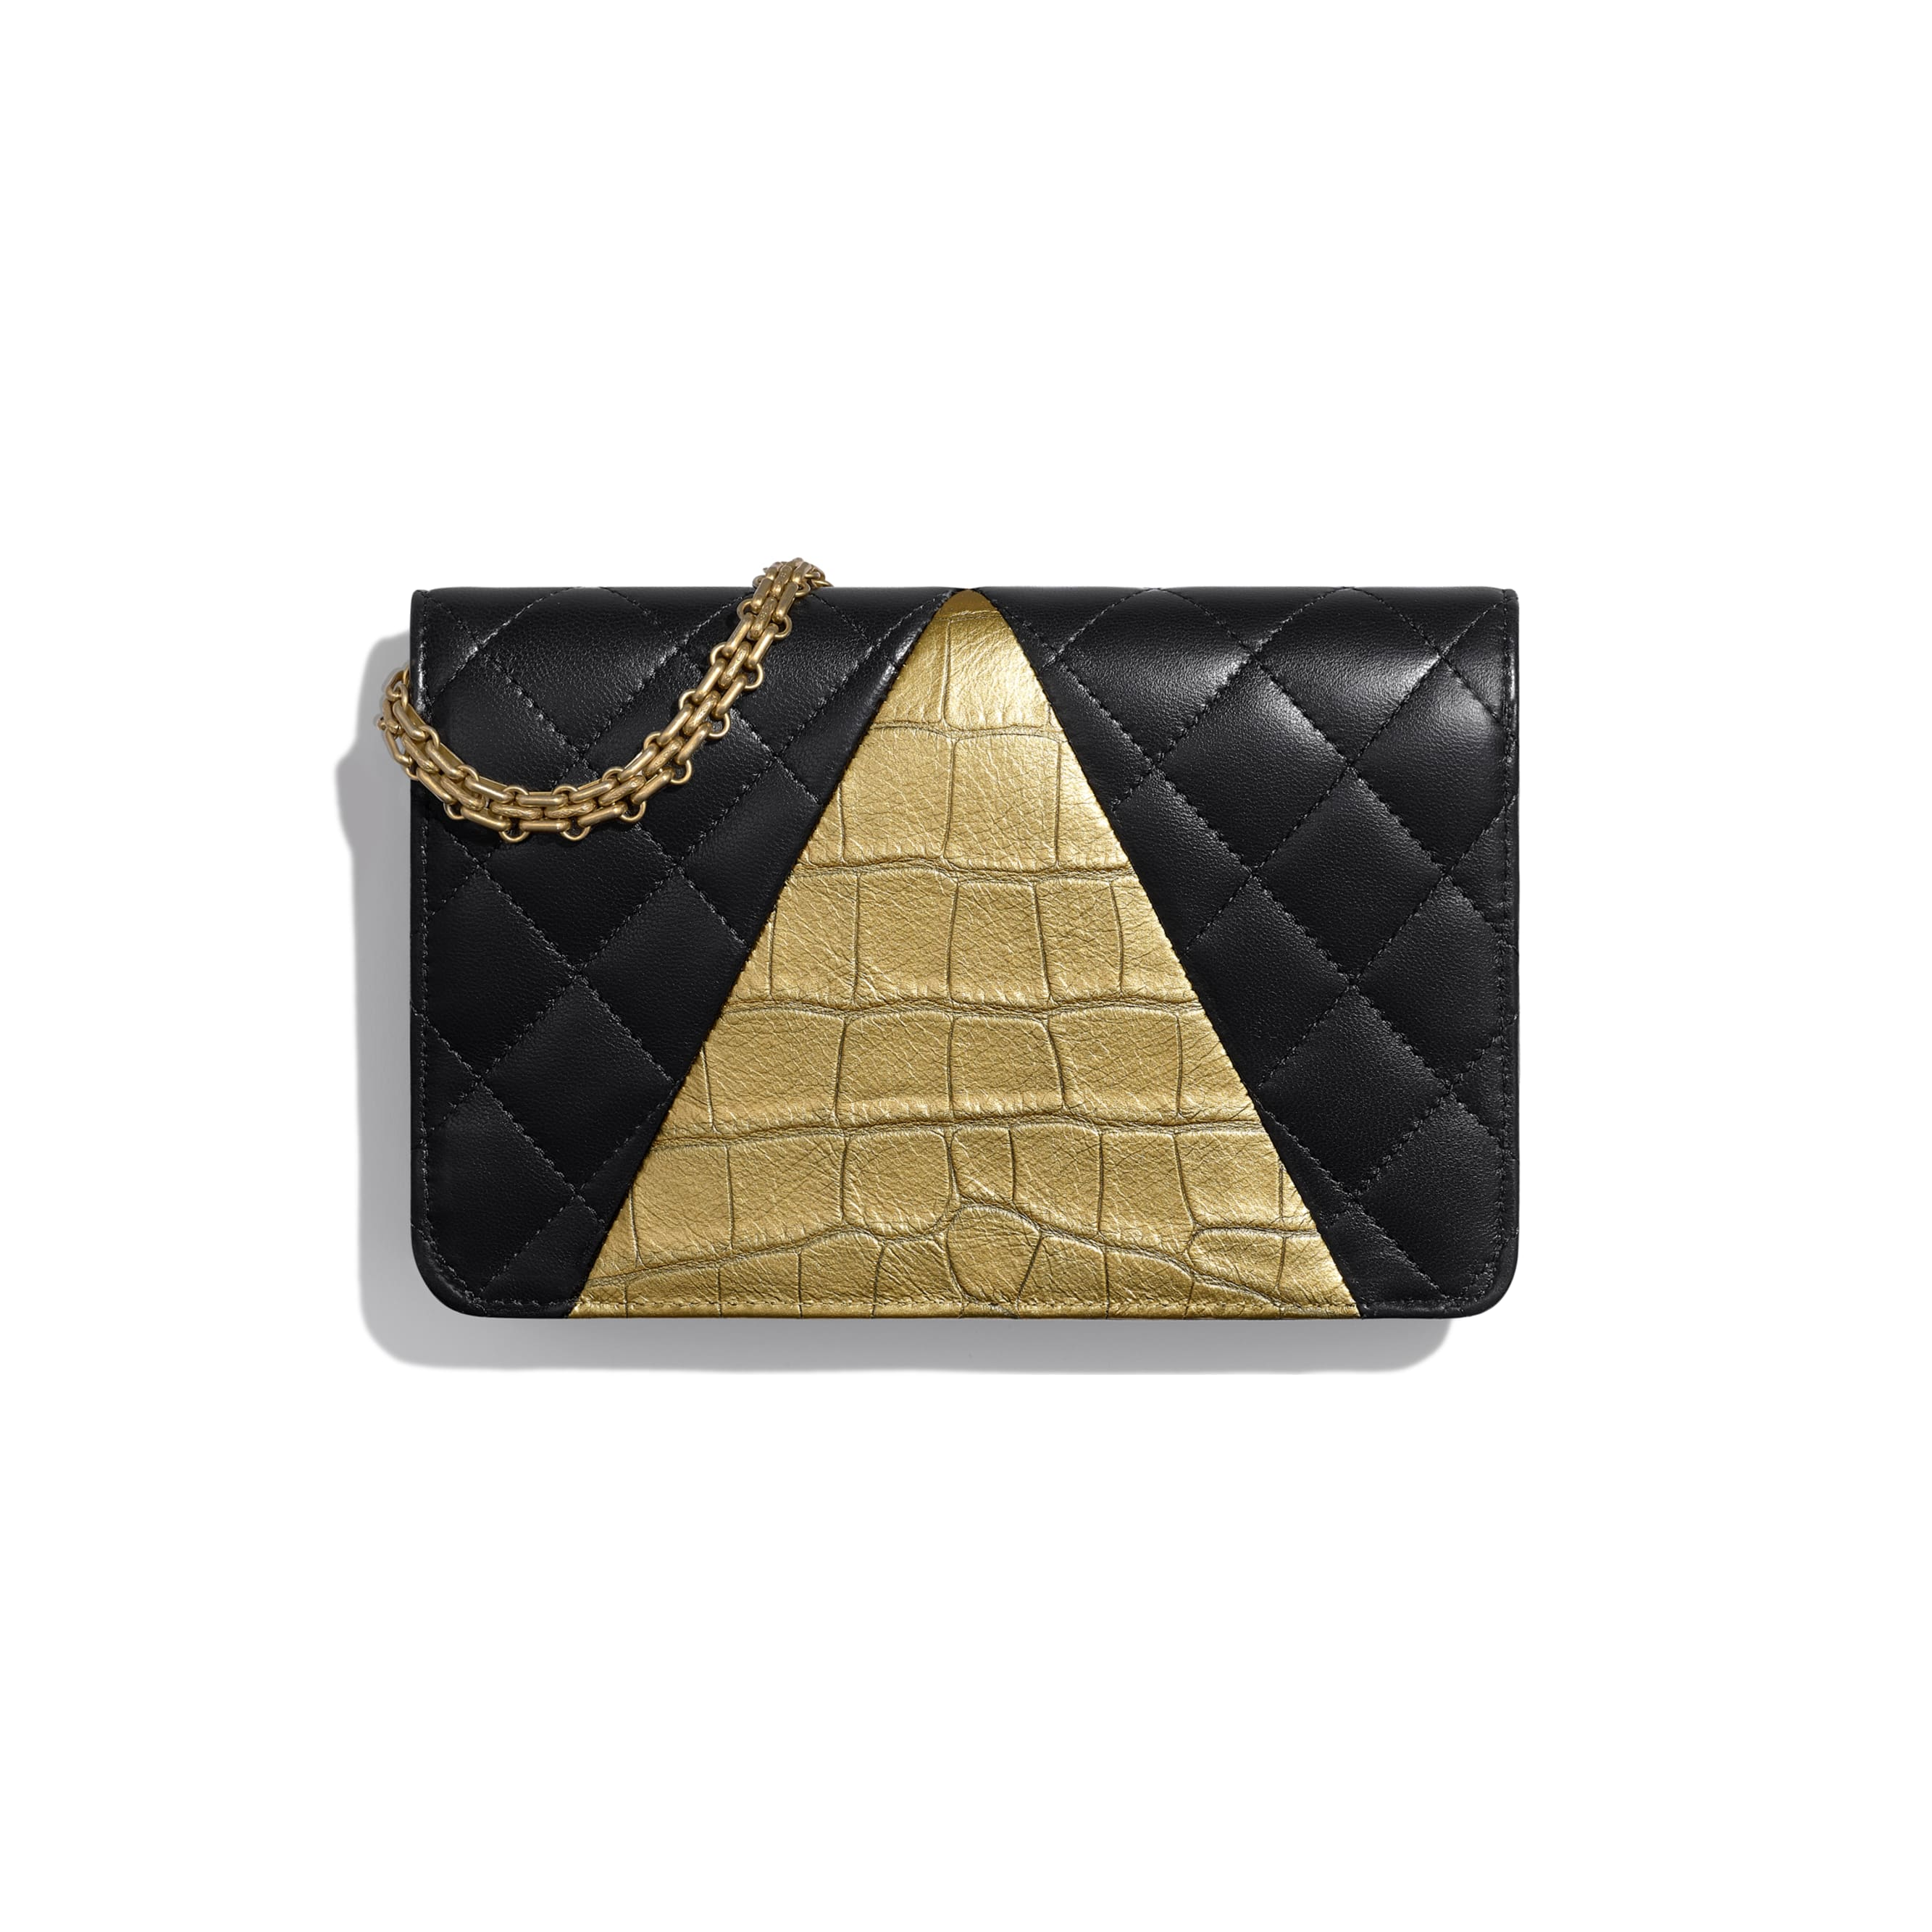 Wallet on Chain - Black & Gold - Lambskin, Crocodile Embossed Calfskin & Gold-Tone Metal - Alternative view - see standard sized version